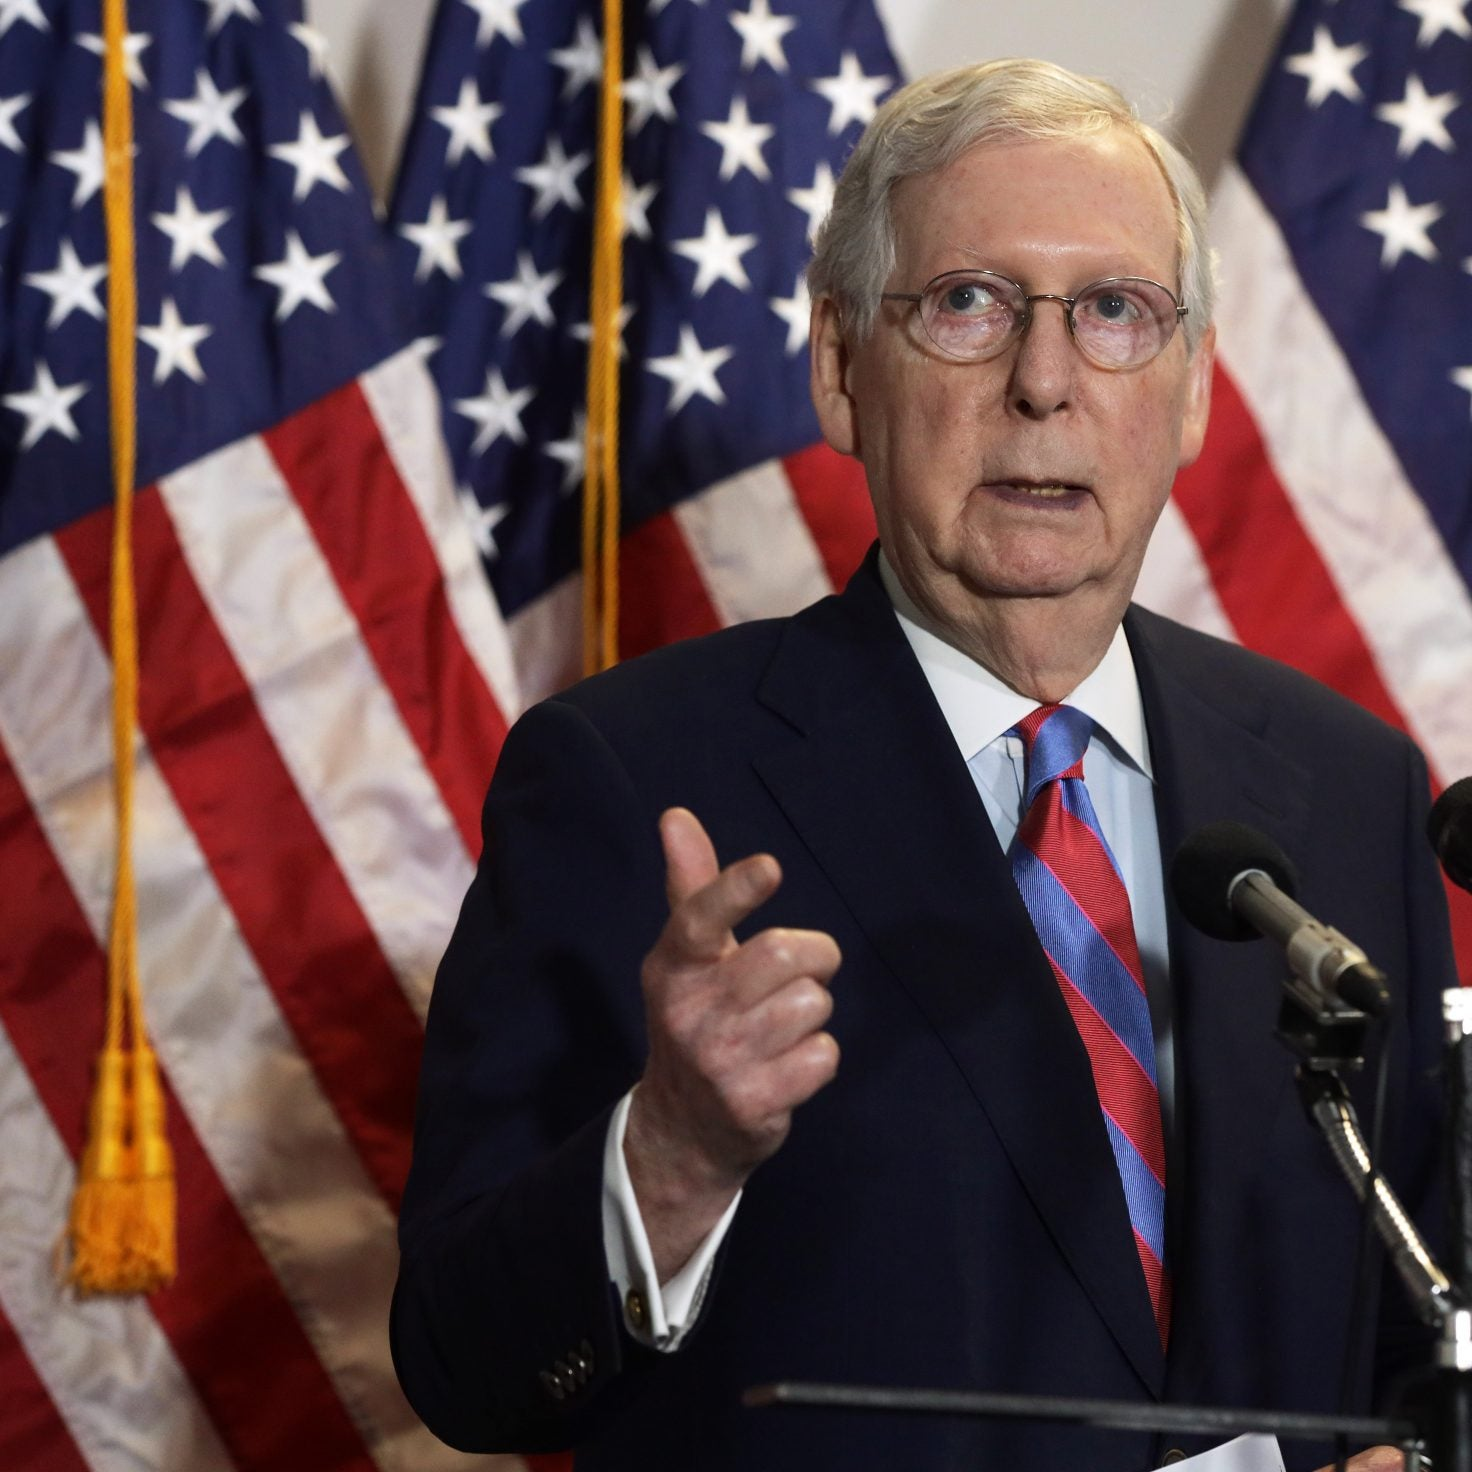 Senate GOP Reject House Democrats' $3 Trillion Coronavirus Bill Before Seeing It